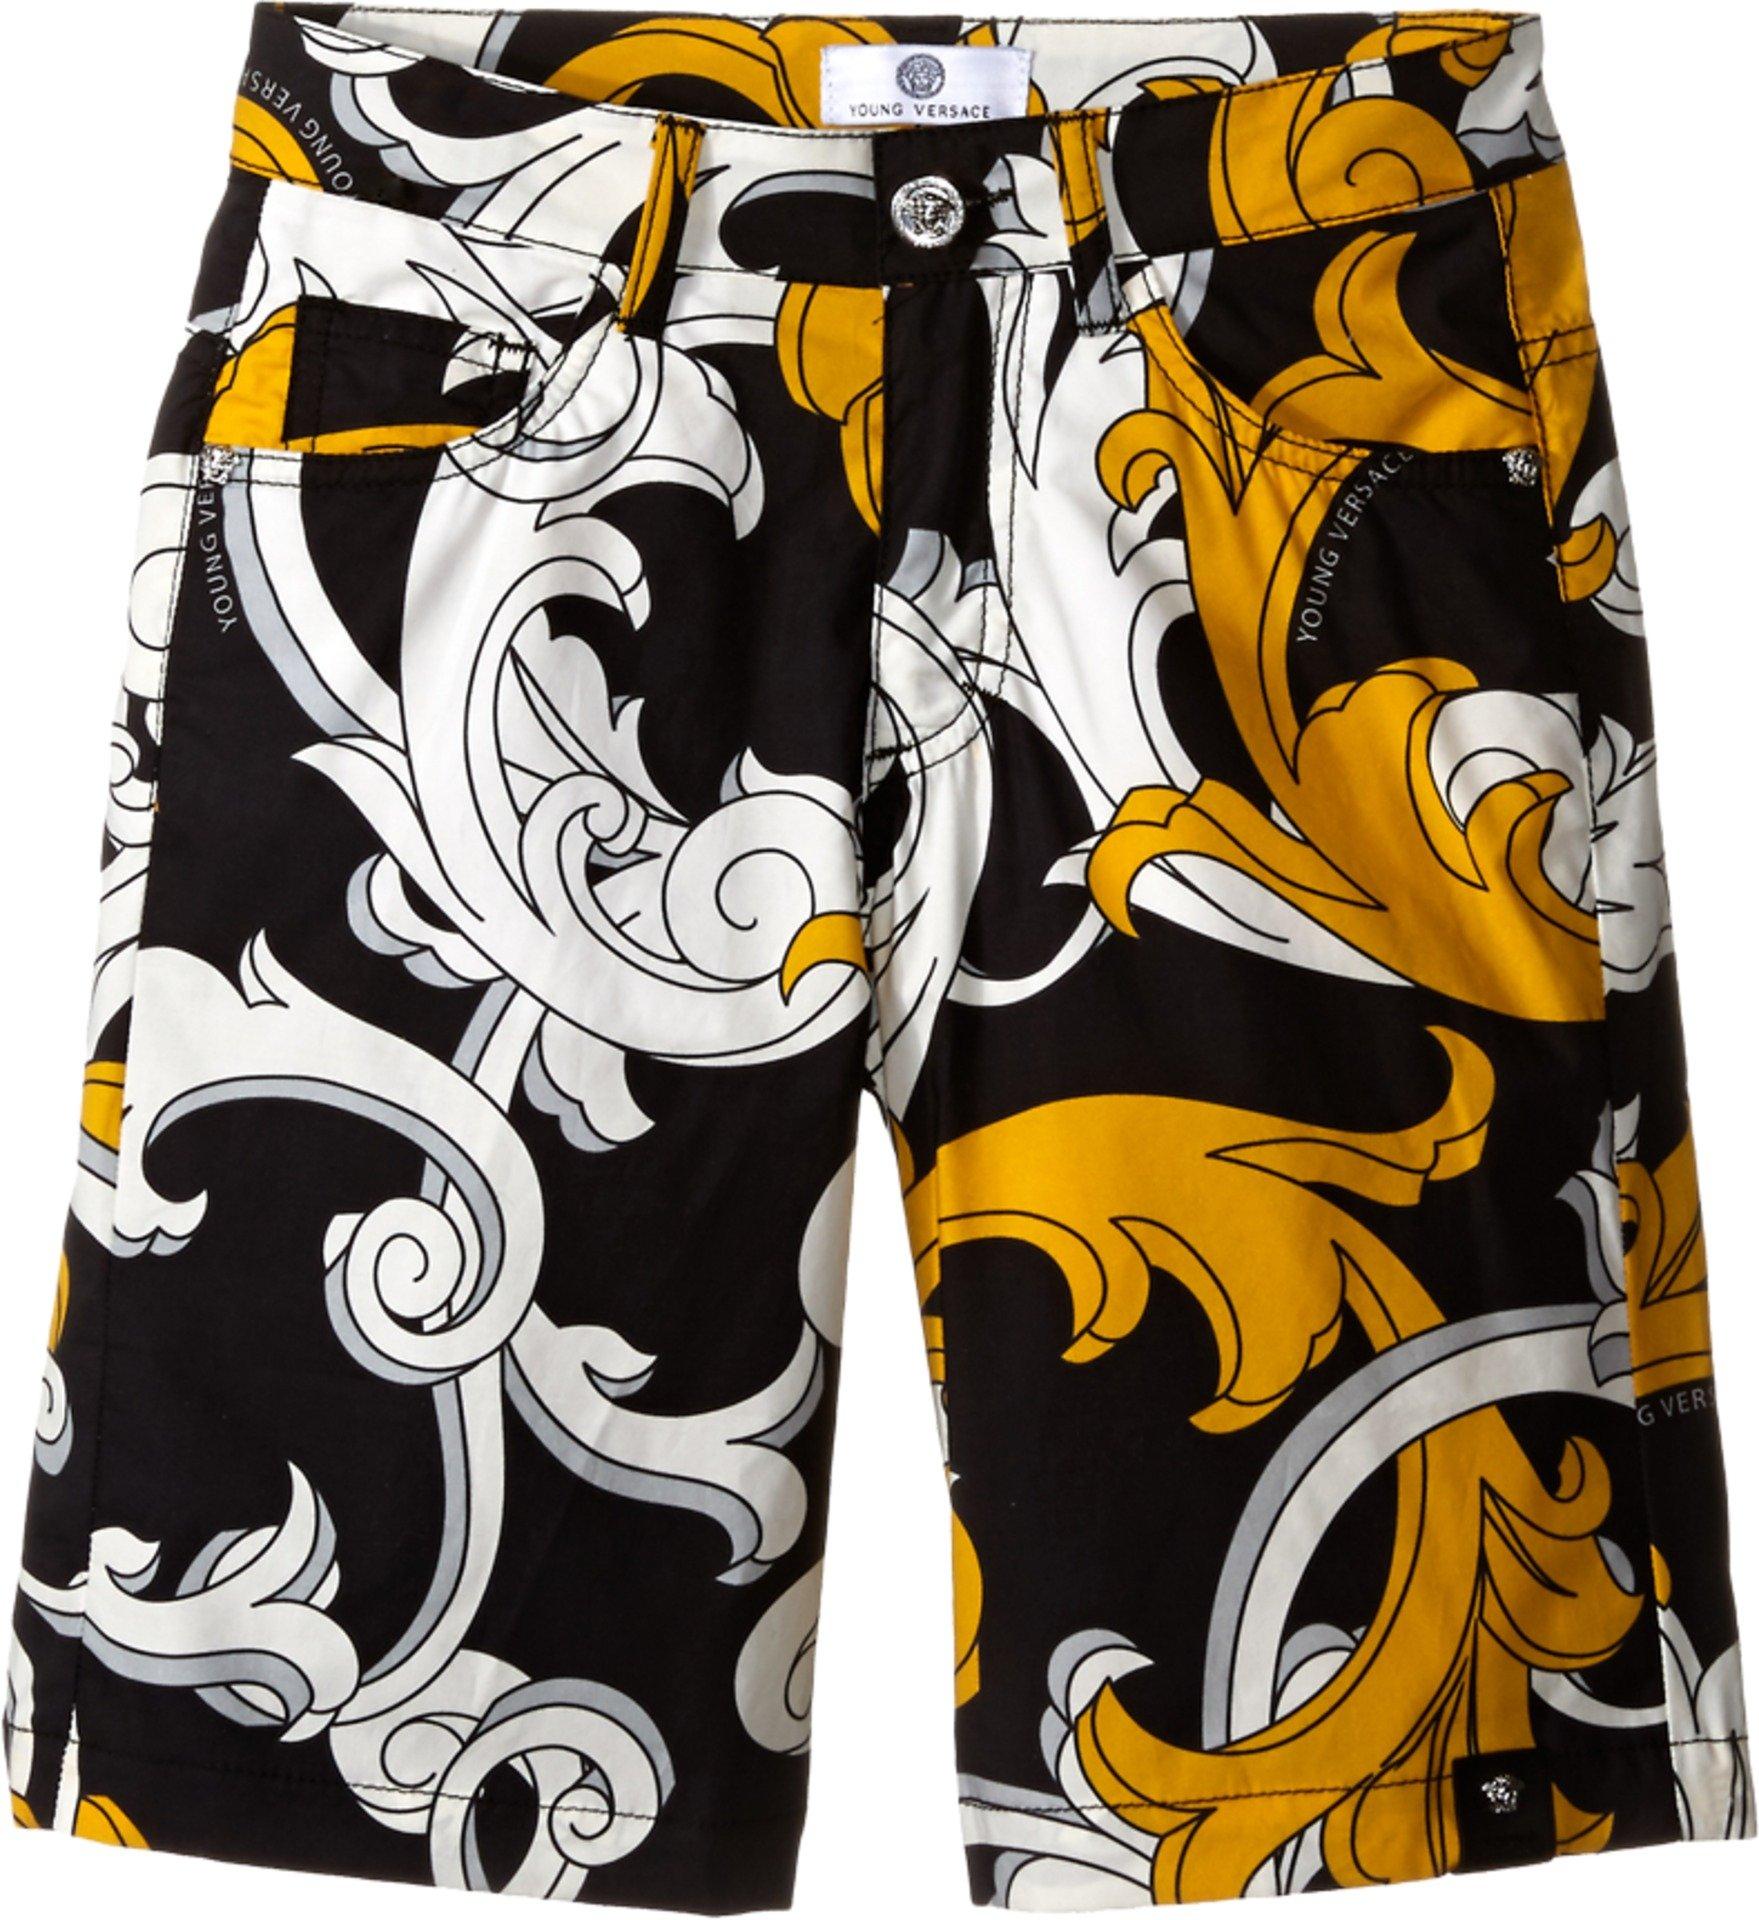 Versace Kids Boys' Macrobarocco Print Shorts with Zipper and Pockets (Big Kids), Black/Gold, XXS 8 X One Size